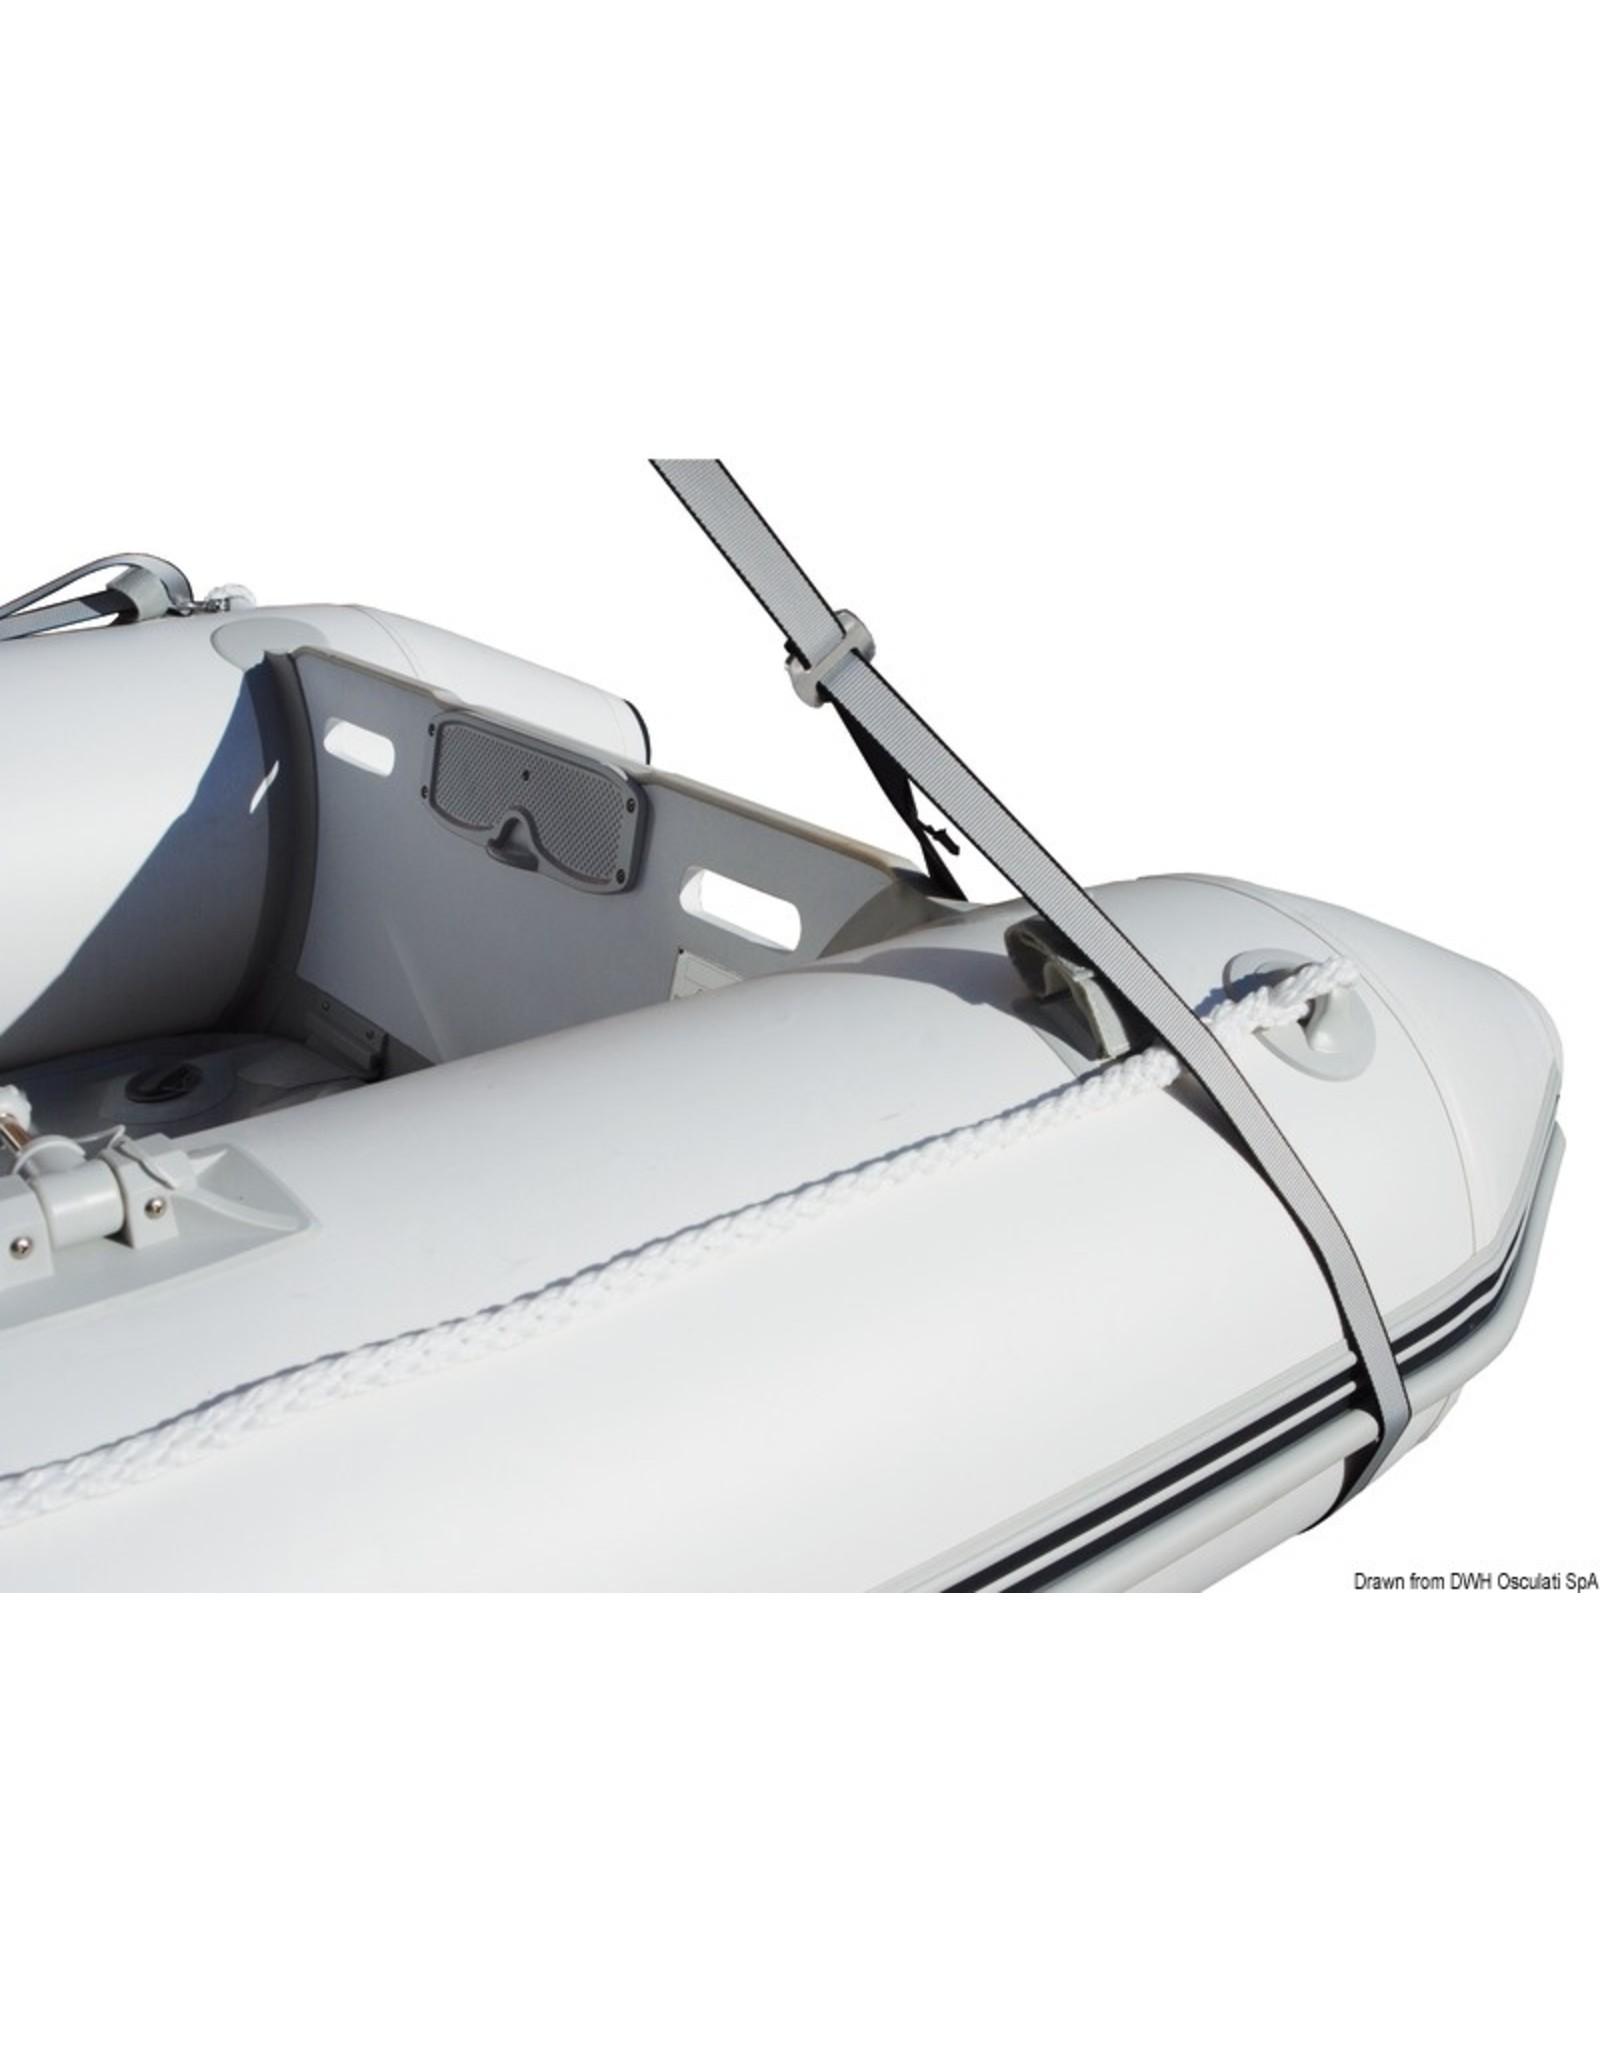 Osculati 3-arm dinghy liftsysteem + 2 riemen